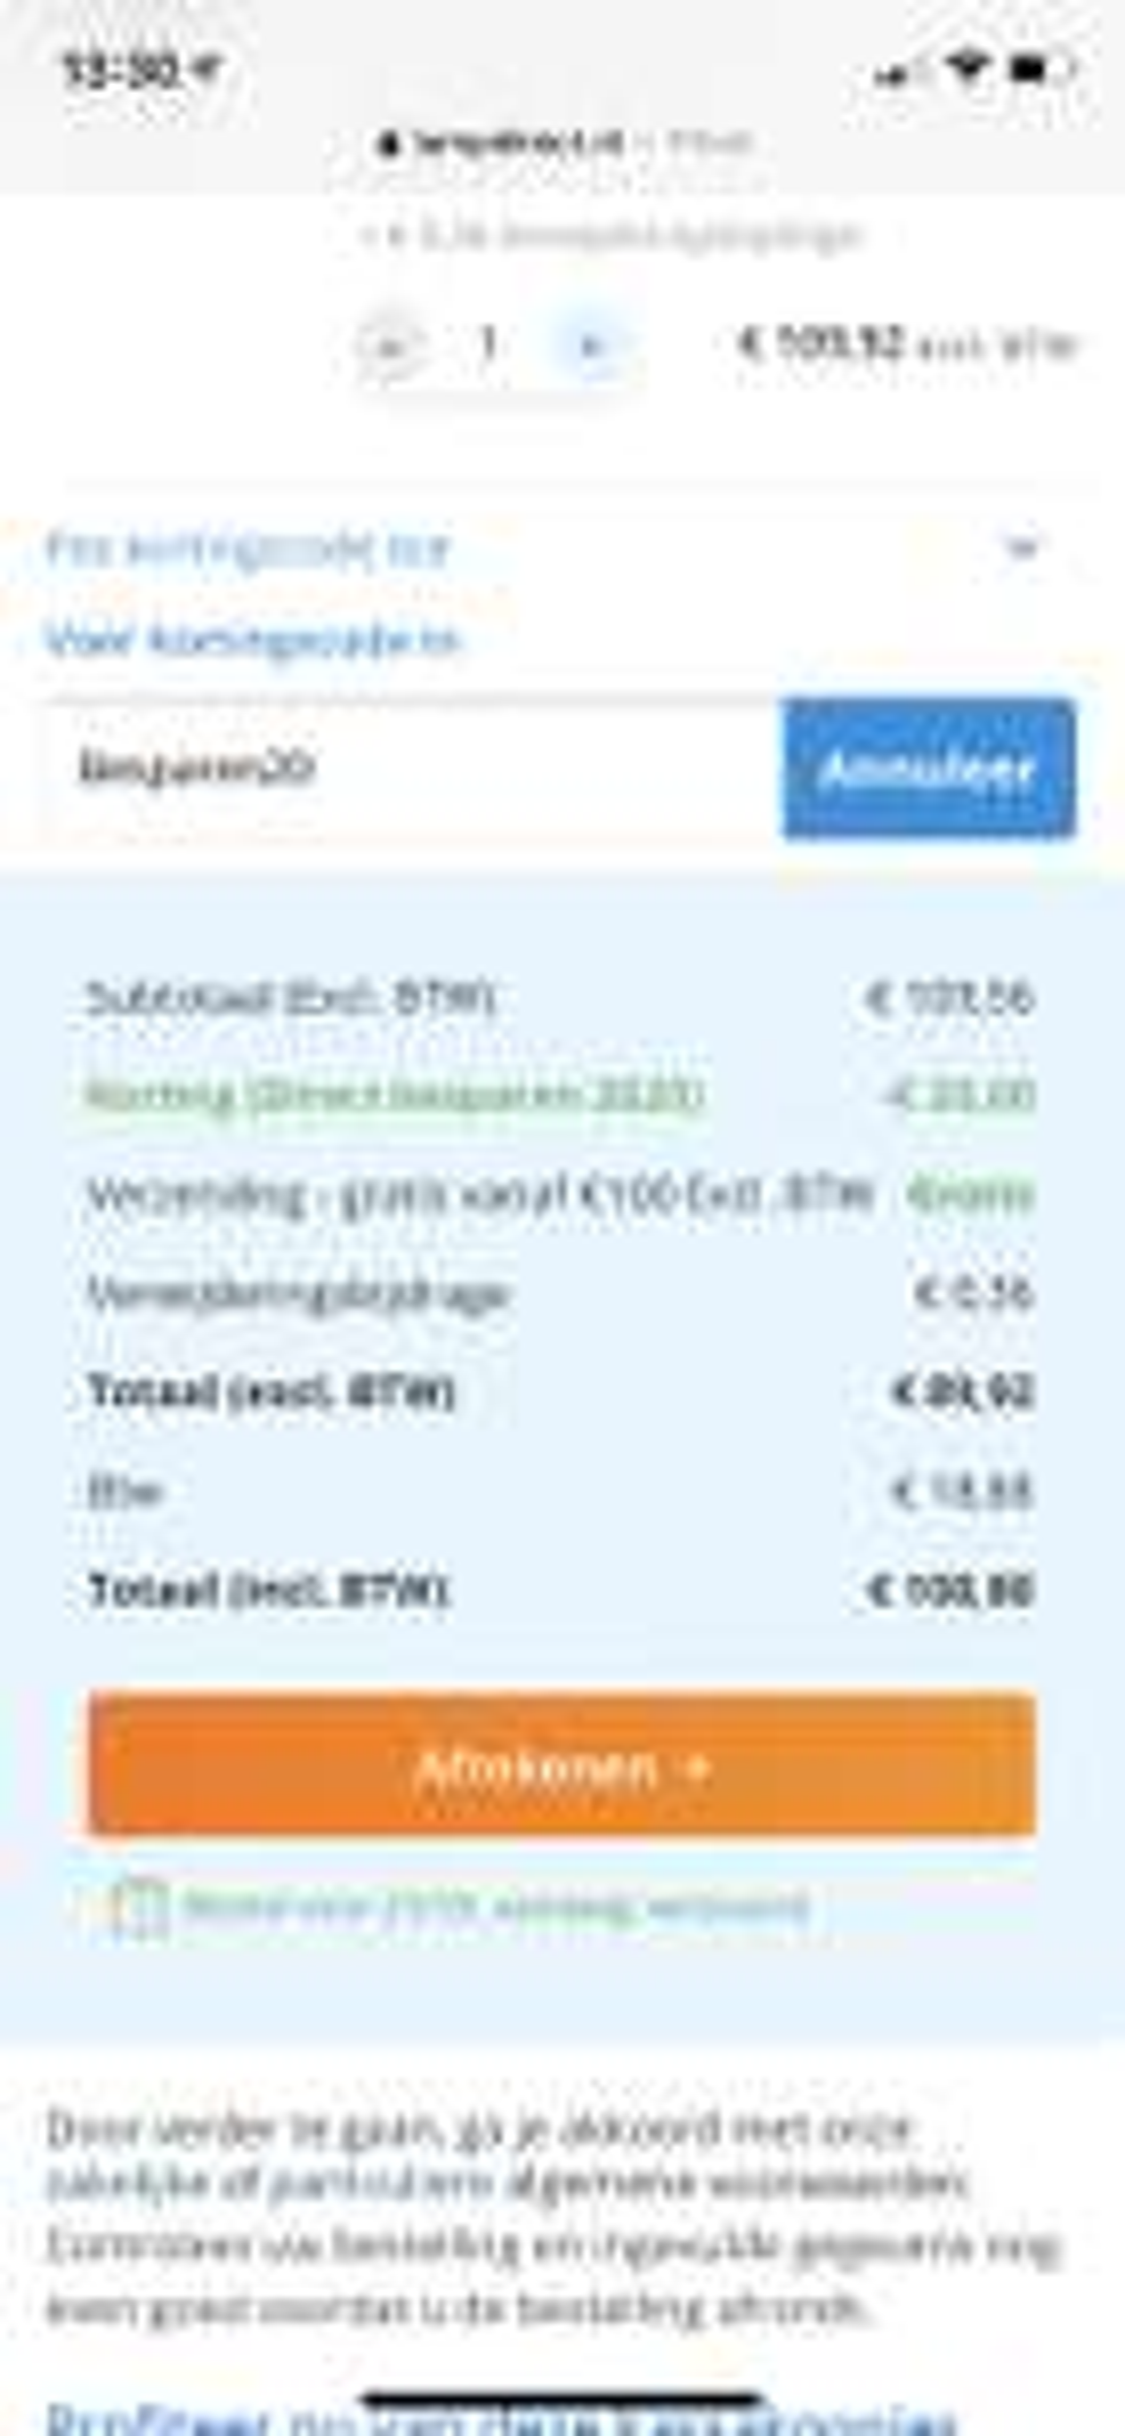 €20 korting bij Lampdirect.nl